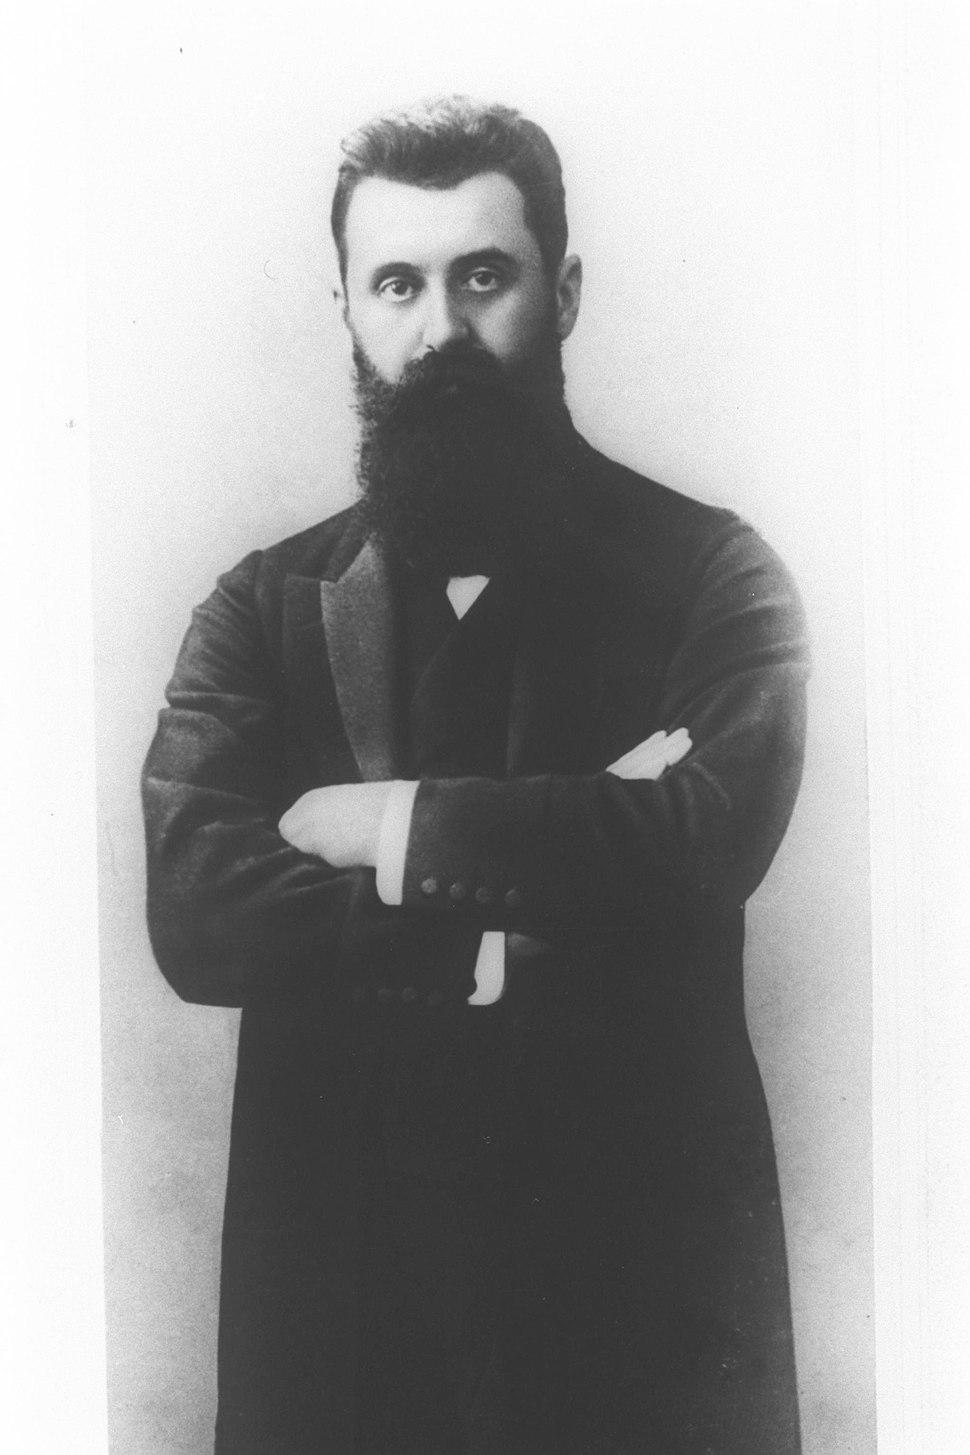 "PORTRAIT OF THEODOR HERZL TAKEN IN 1903 BY PAINTER EFRAIM MOSHE LILIAN. פורטרט של תאודור הרצל, אשר צולם ע""י הצייר אפרים משה ליליין בשנת 1903."